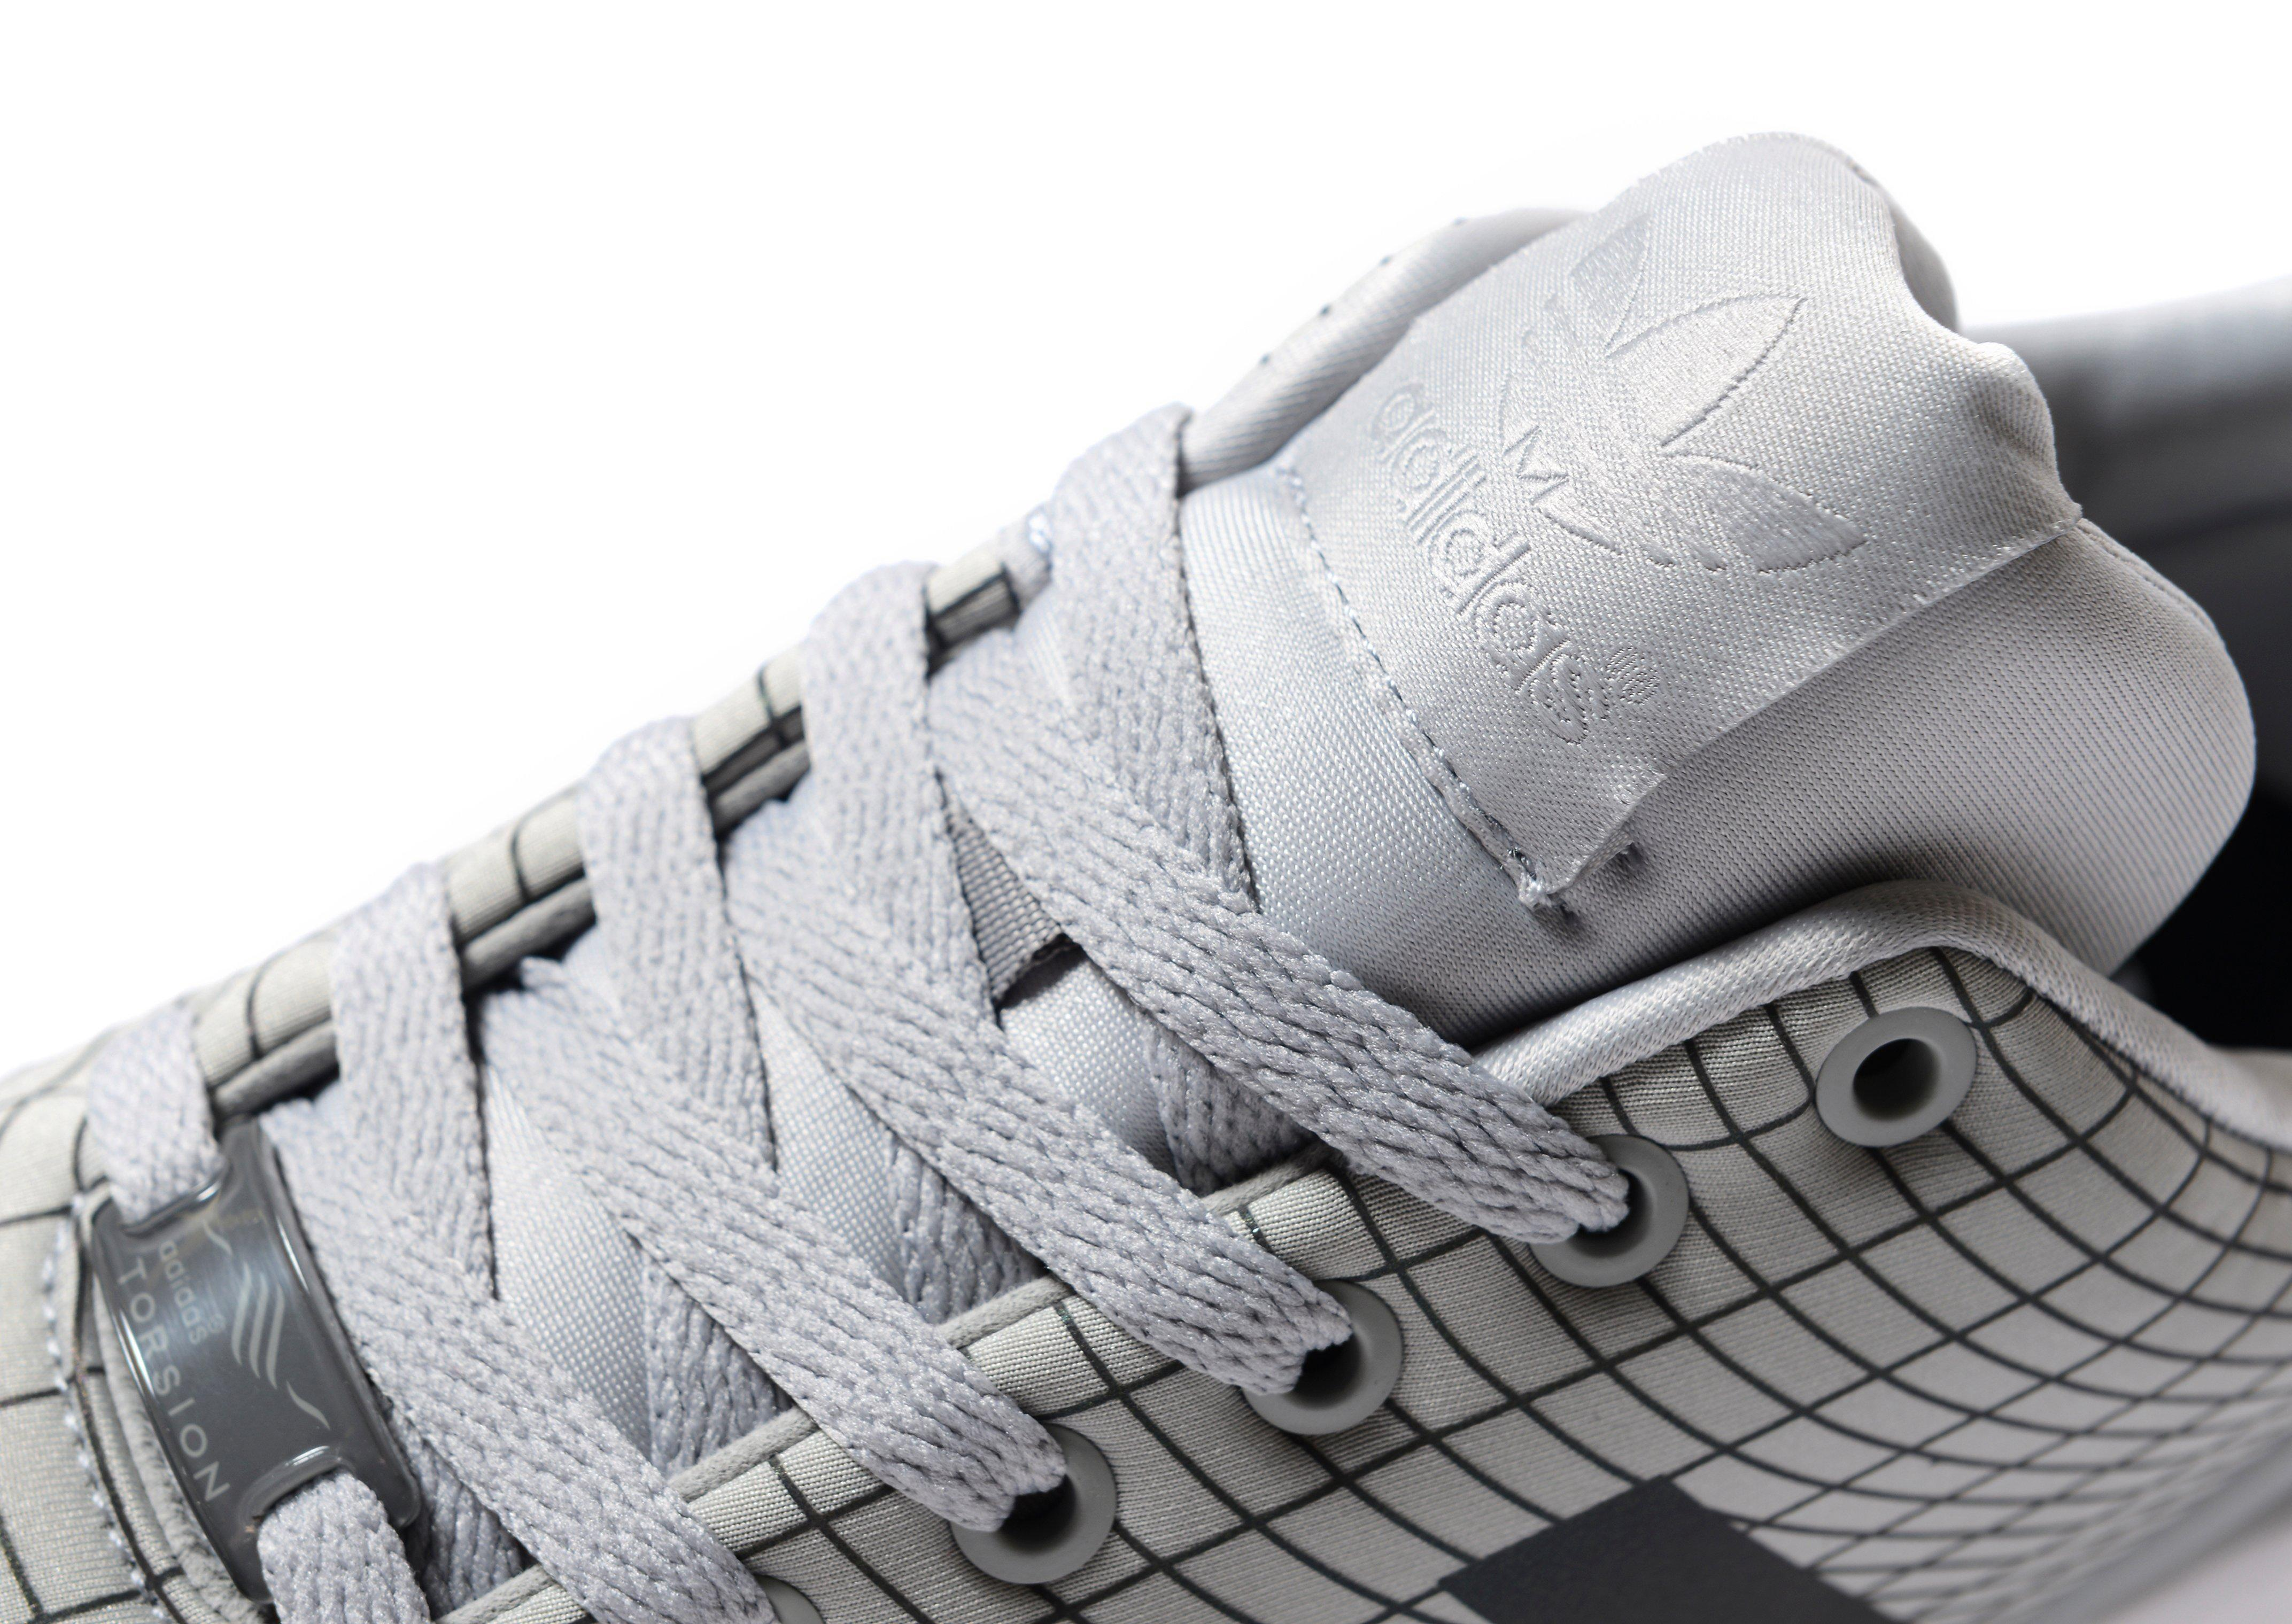 premium selection a4a6e 71f08 ... purchase lyst adidas originals zx flux xeno in gray for men 009b9 7dcf2